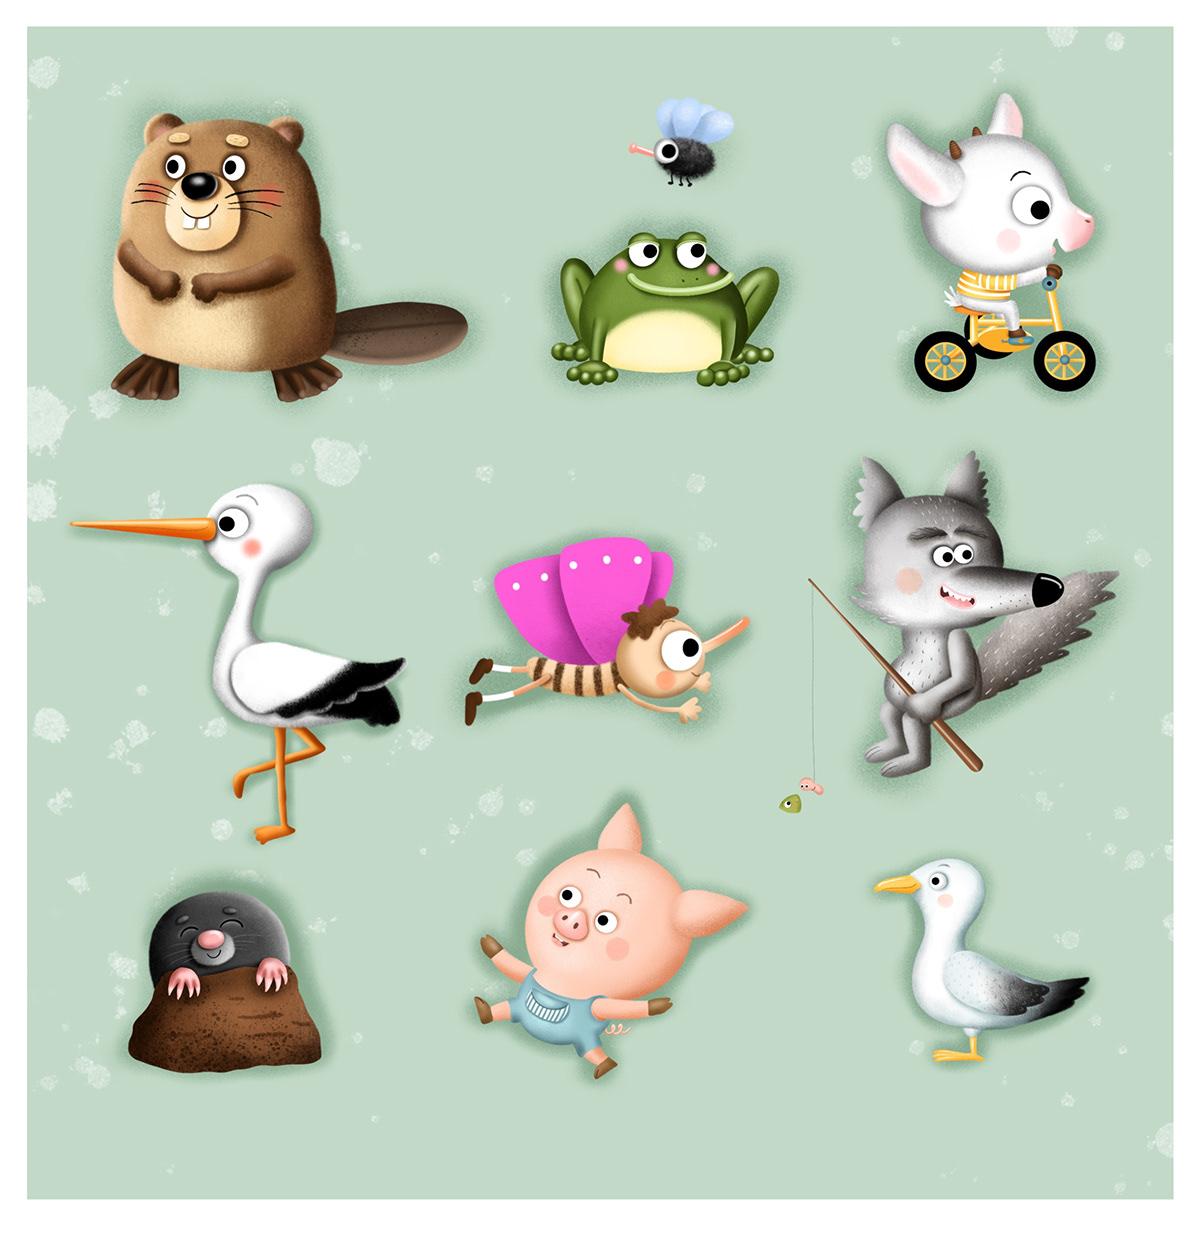 animals beaver childrens illustration frog Mole pig seagull wolf